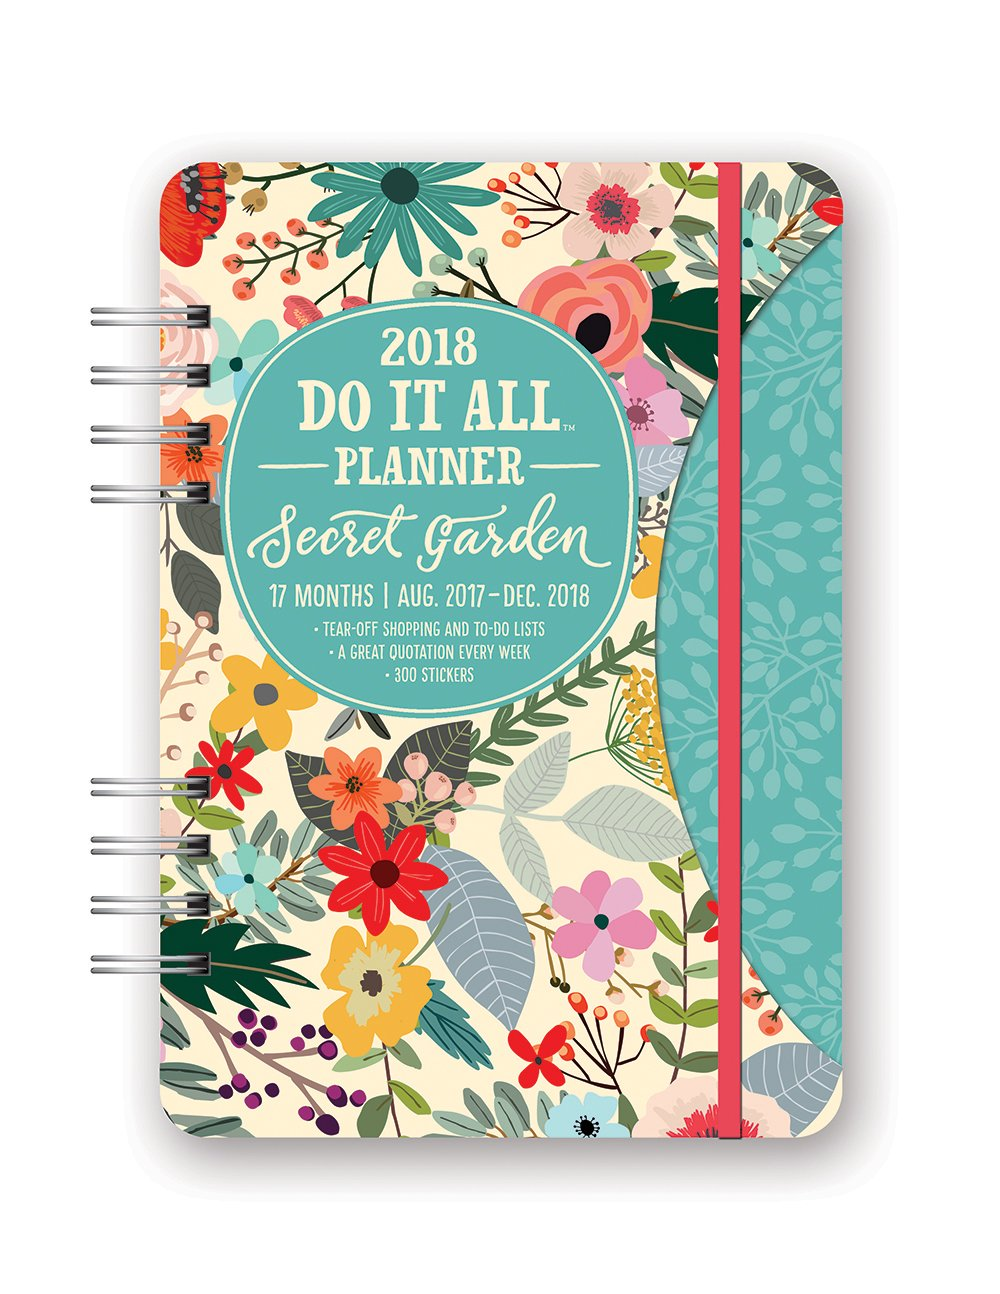 Do It All Planner (Secret Garden Edition)